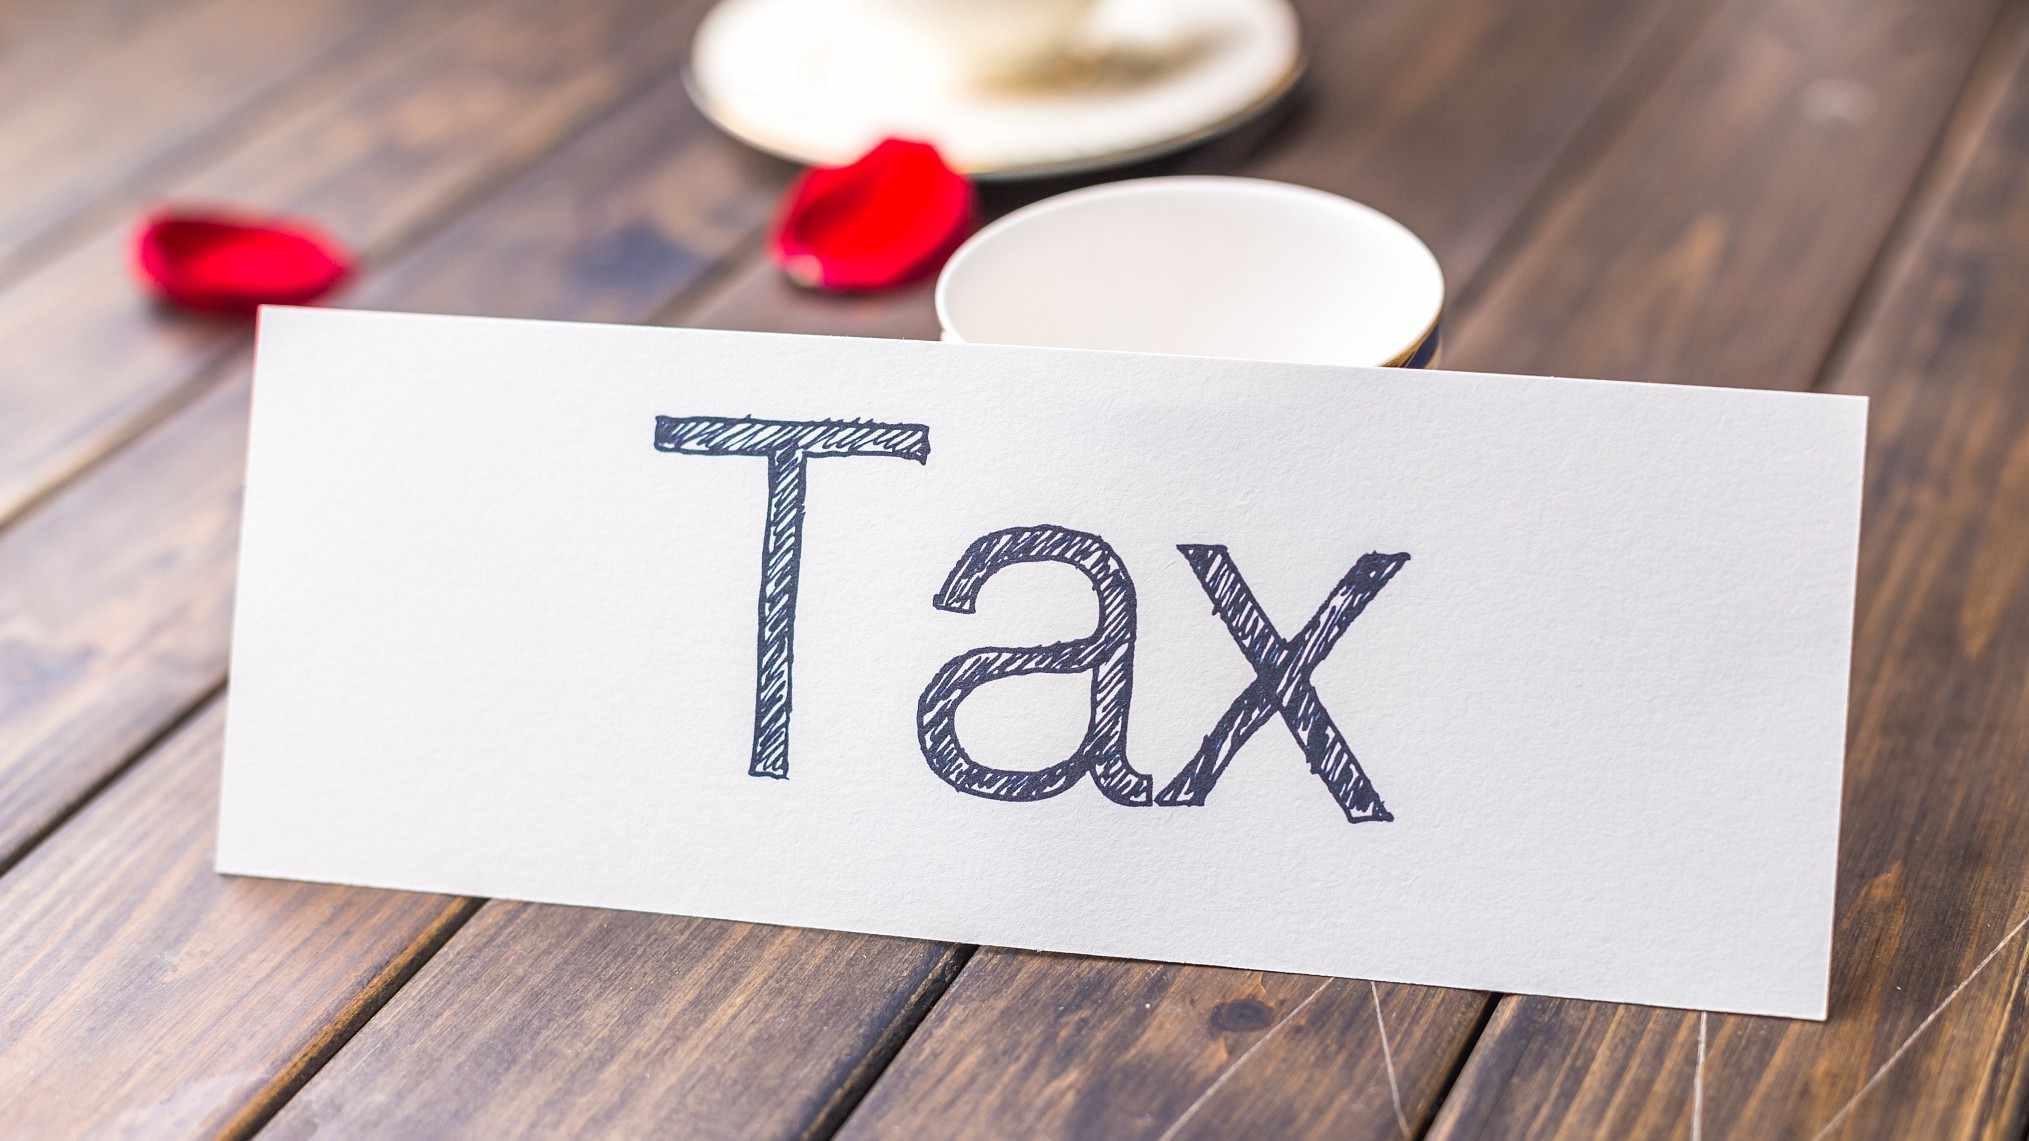 China 'cracks hard nut' with new tax reform